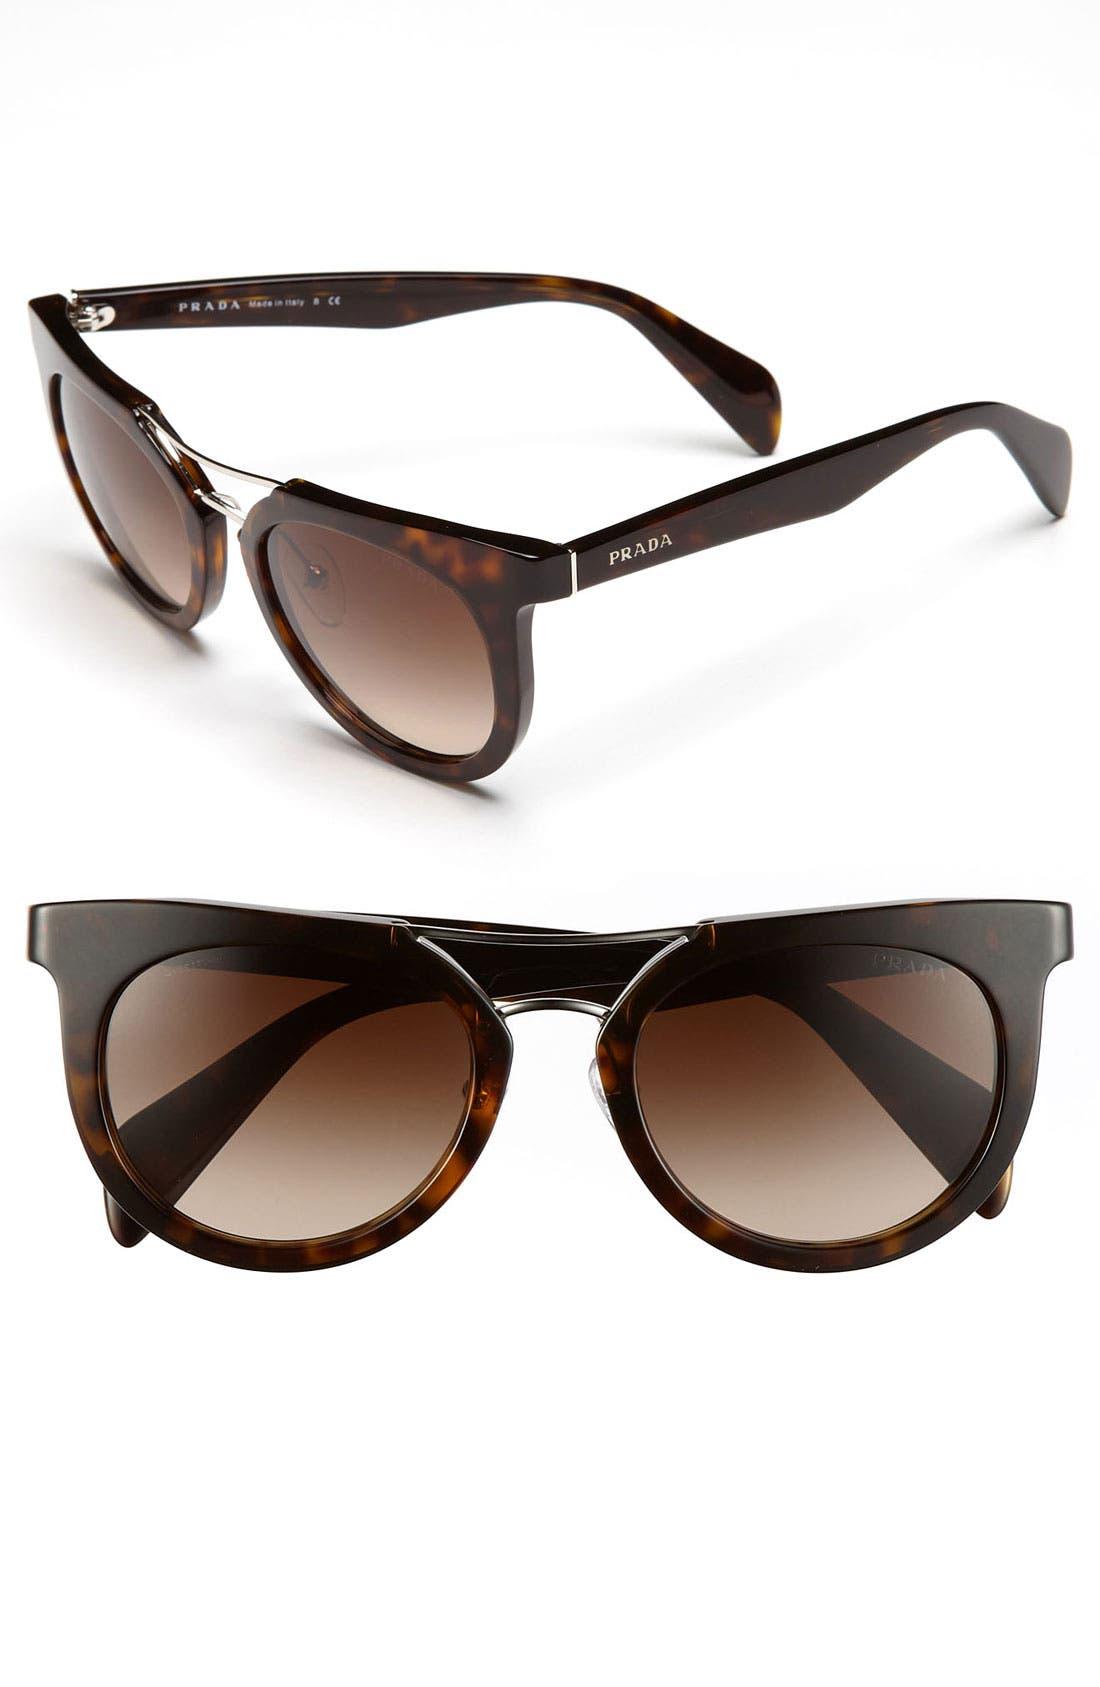 Main Image - Prada 'Timeless' 51mm Sunglasses